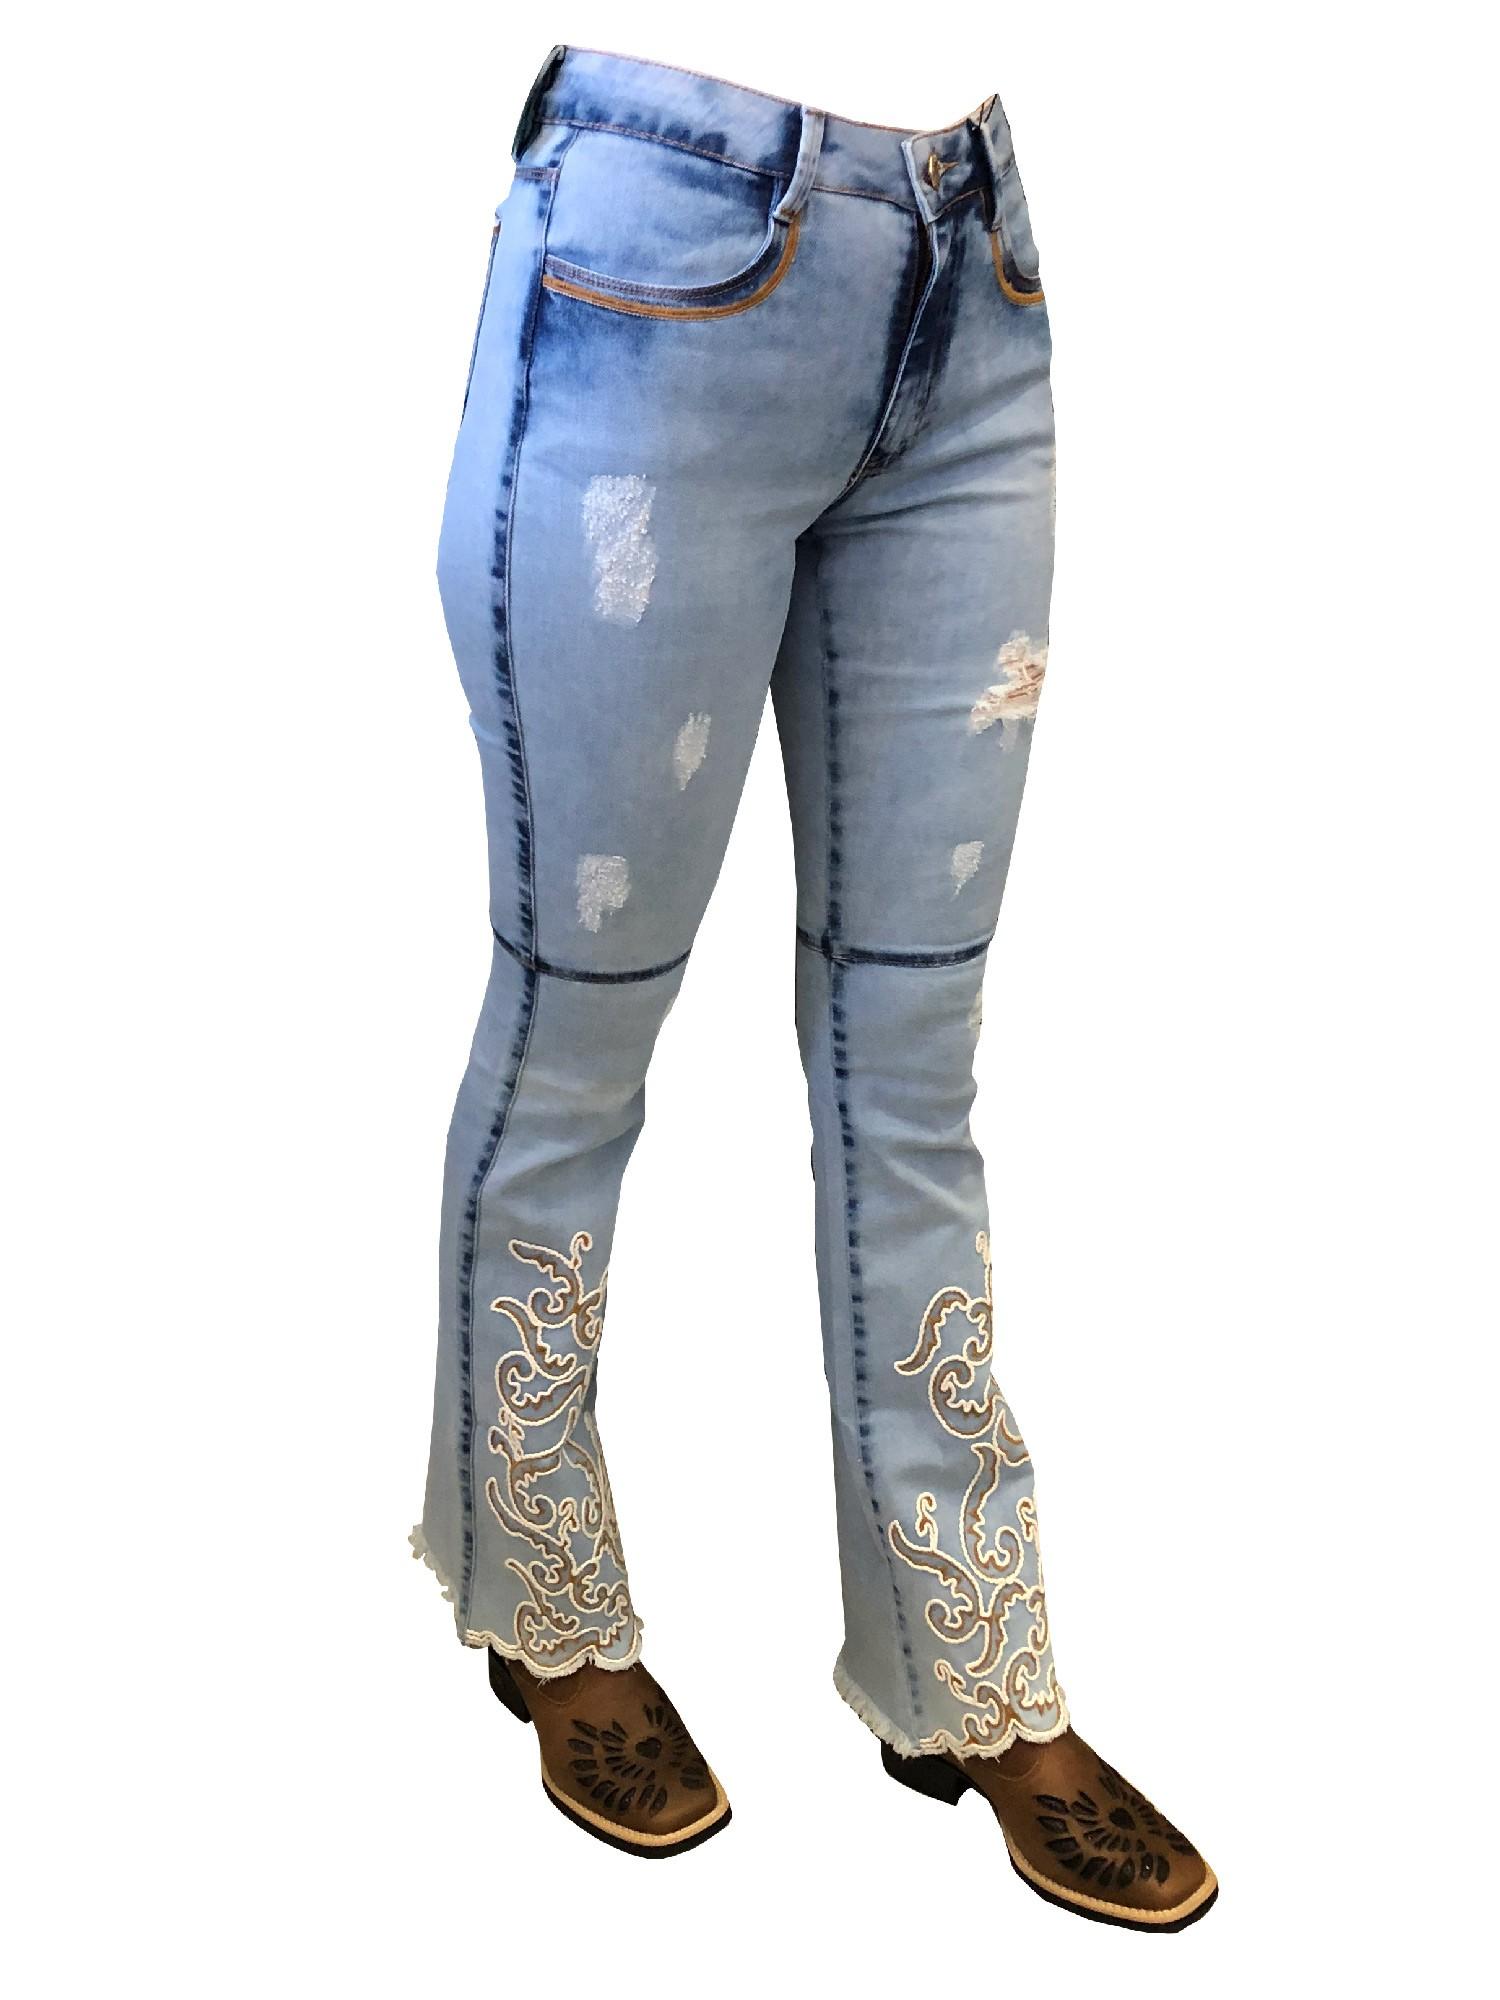 Calça Jeans Feminina Flare Bordada Cós Medio Ref. 20601